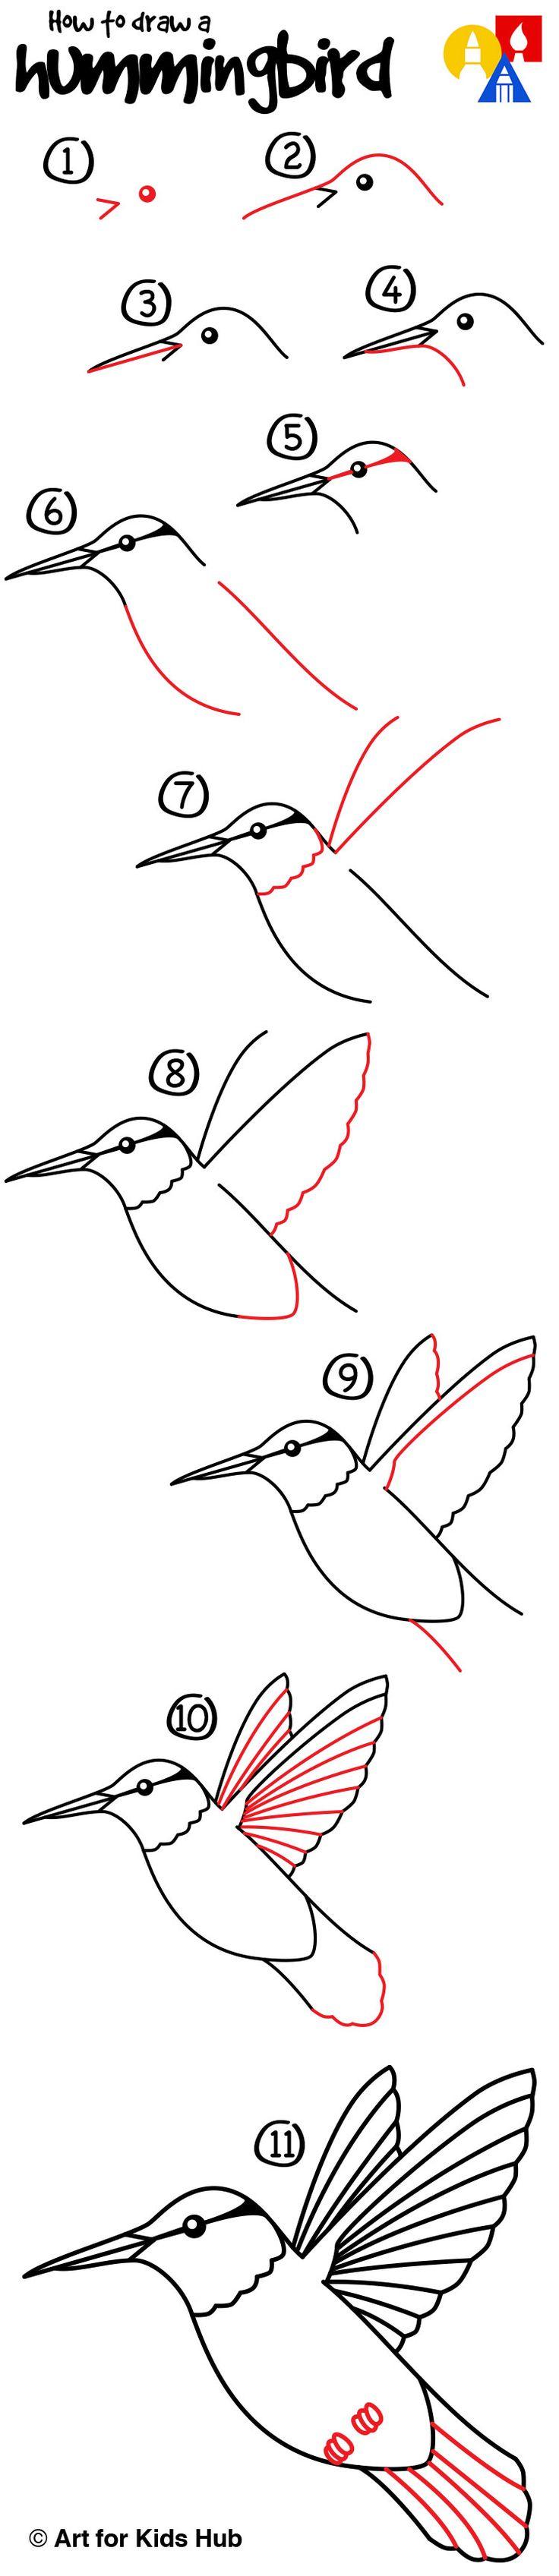 Image from http://artforkidshub.com/wp-content/uploads/2015/02/hummingbird-pinterest.jpg.